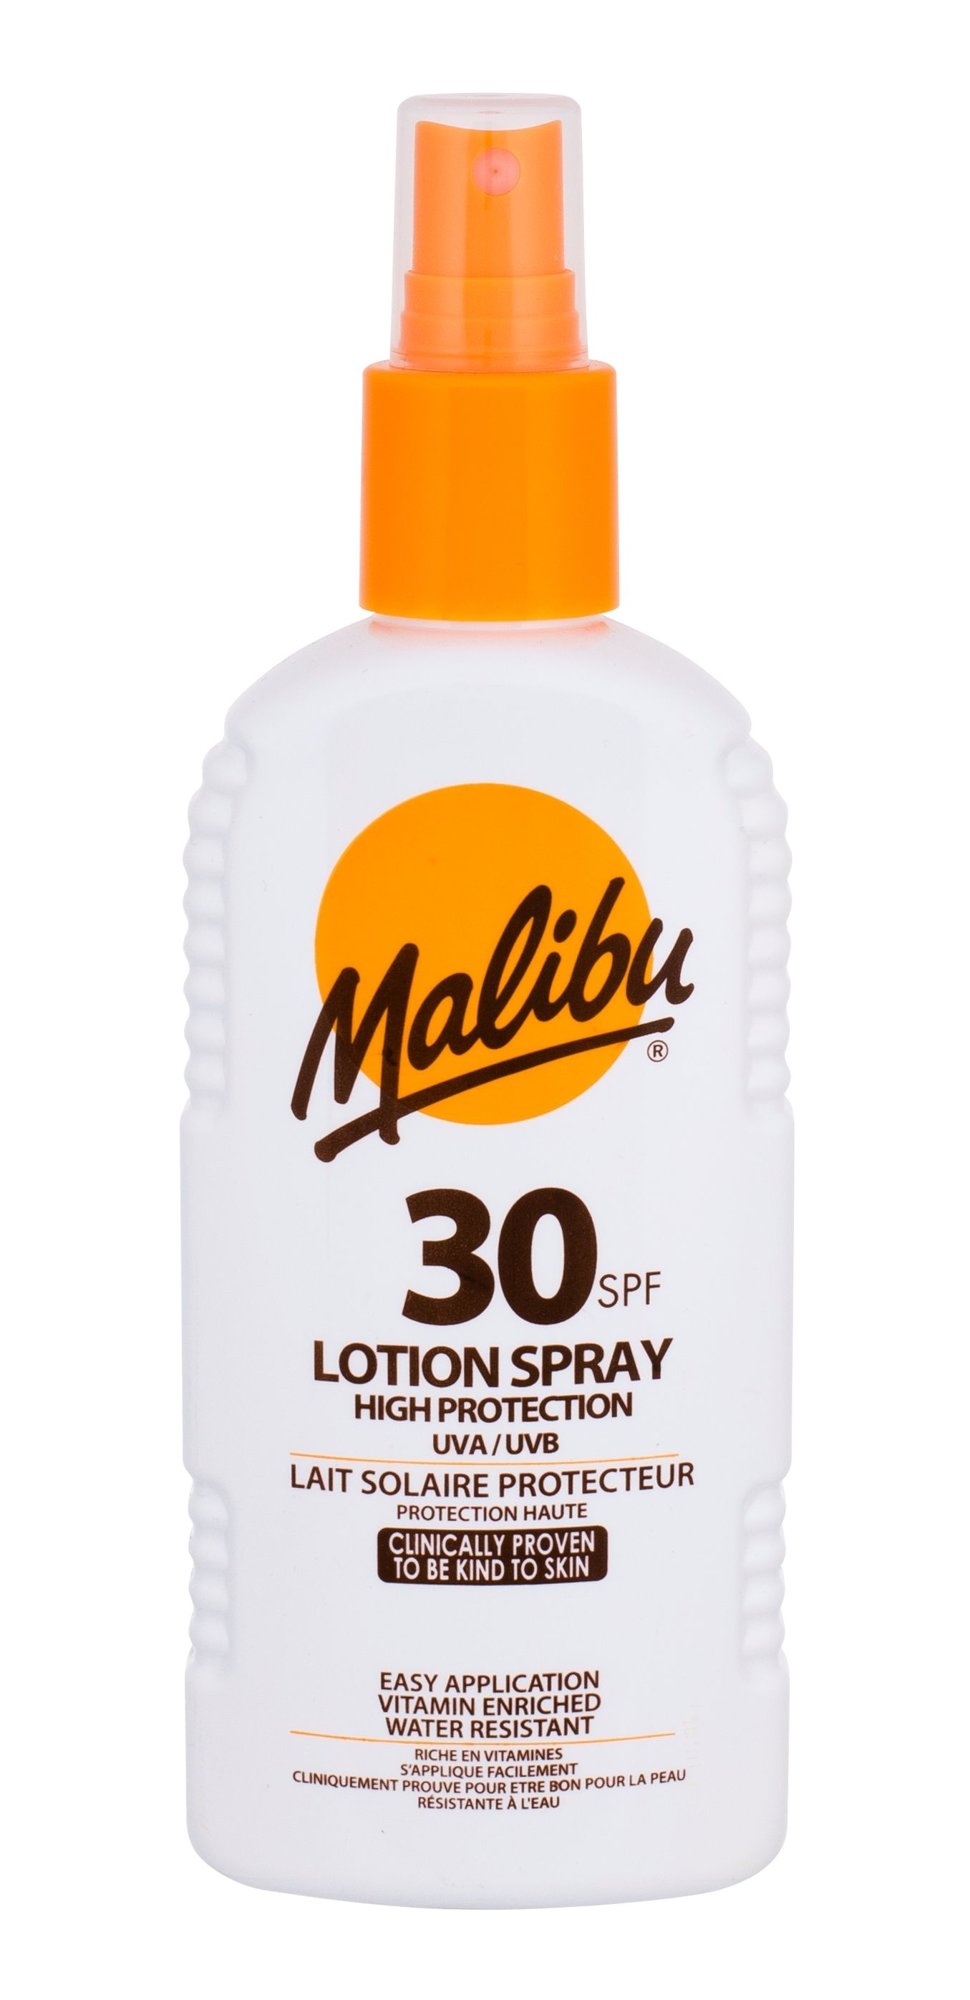 Malibu Lotion Spray Cosmetic 200ml